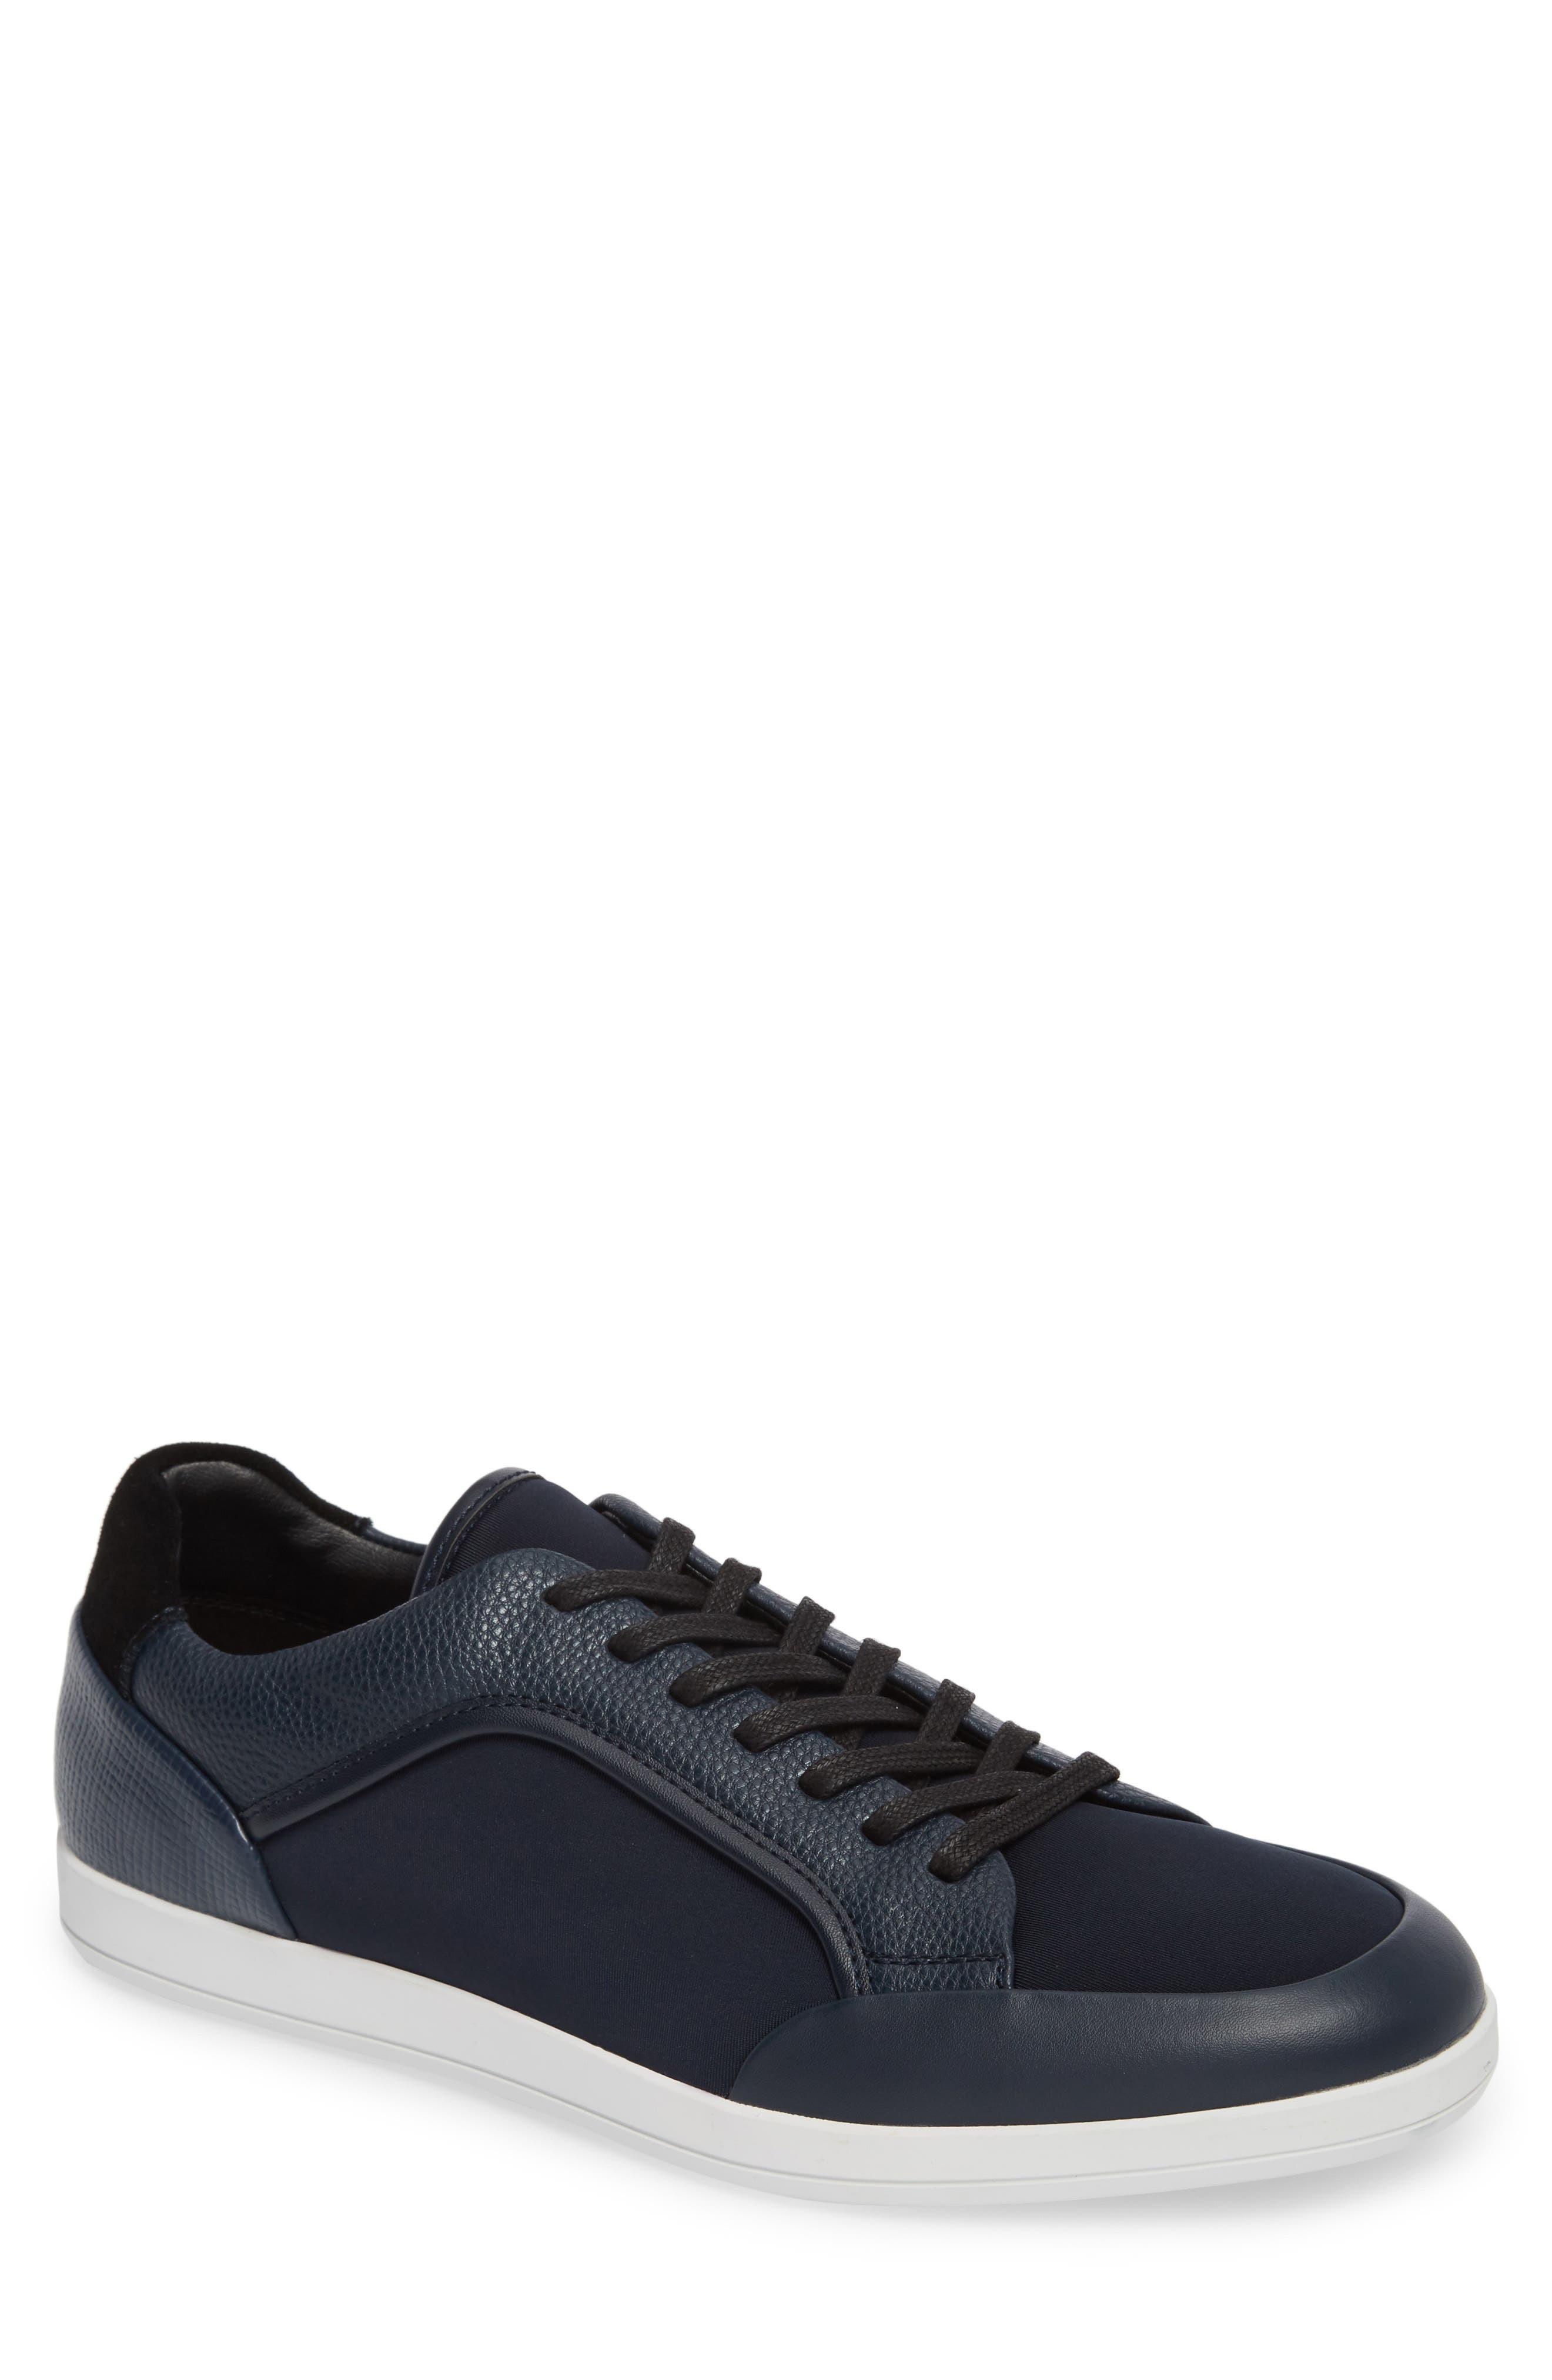 Main Image - Calvin Klein Masen Sneaker (Men)